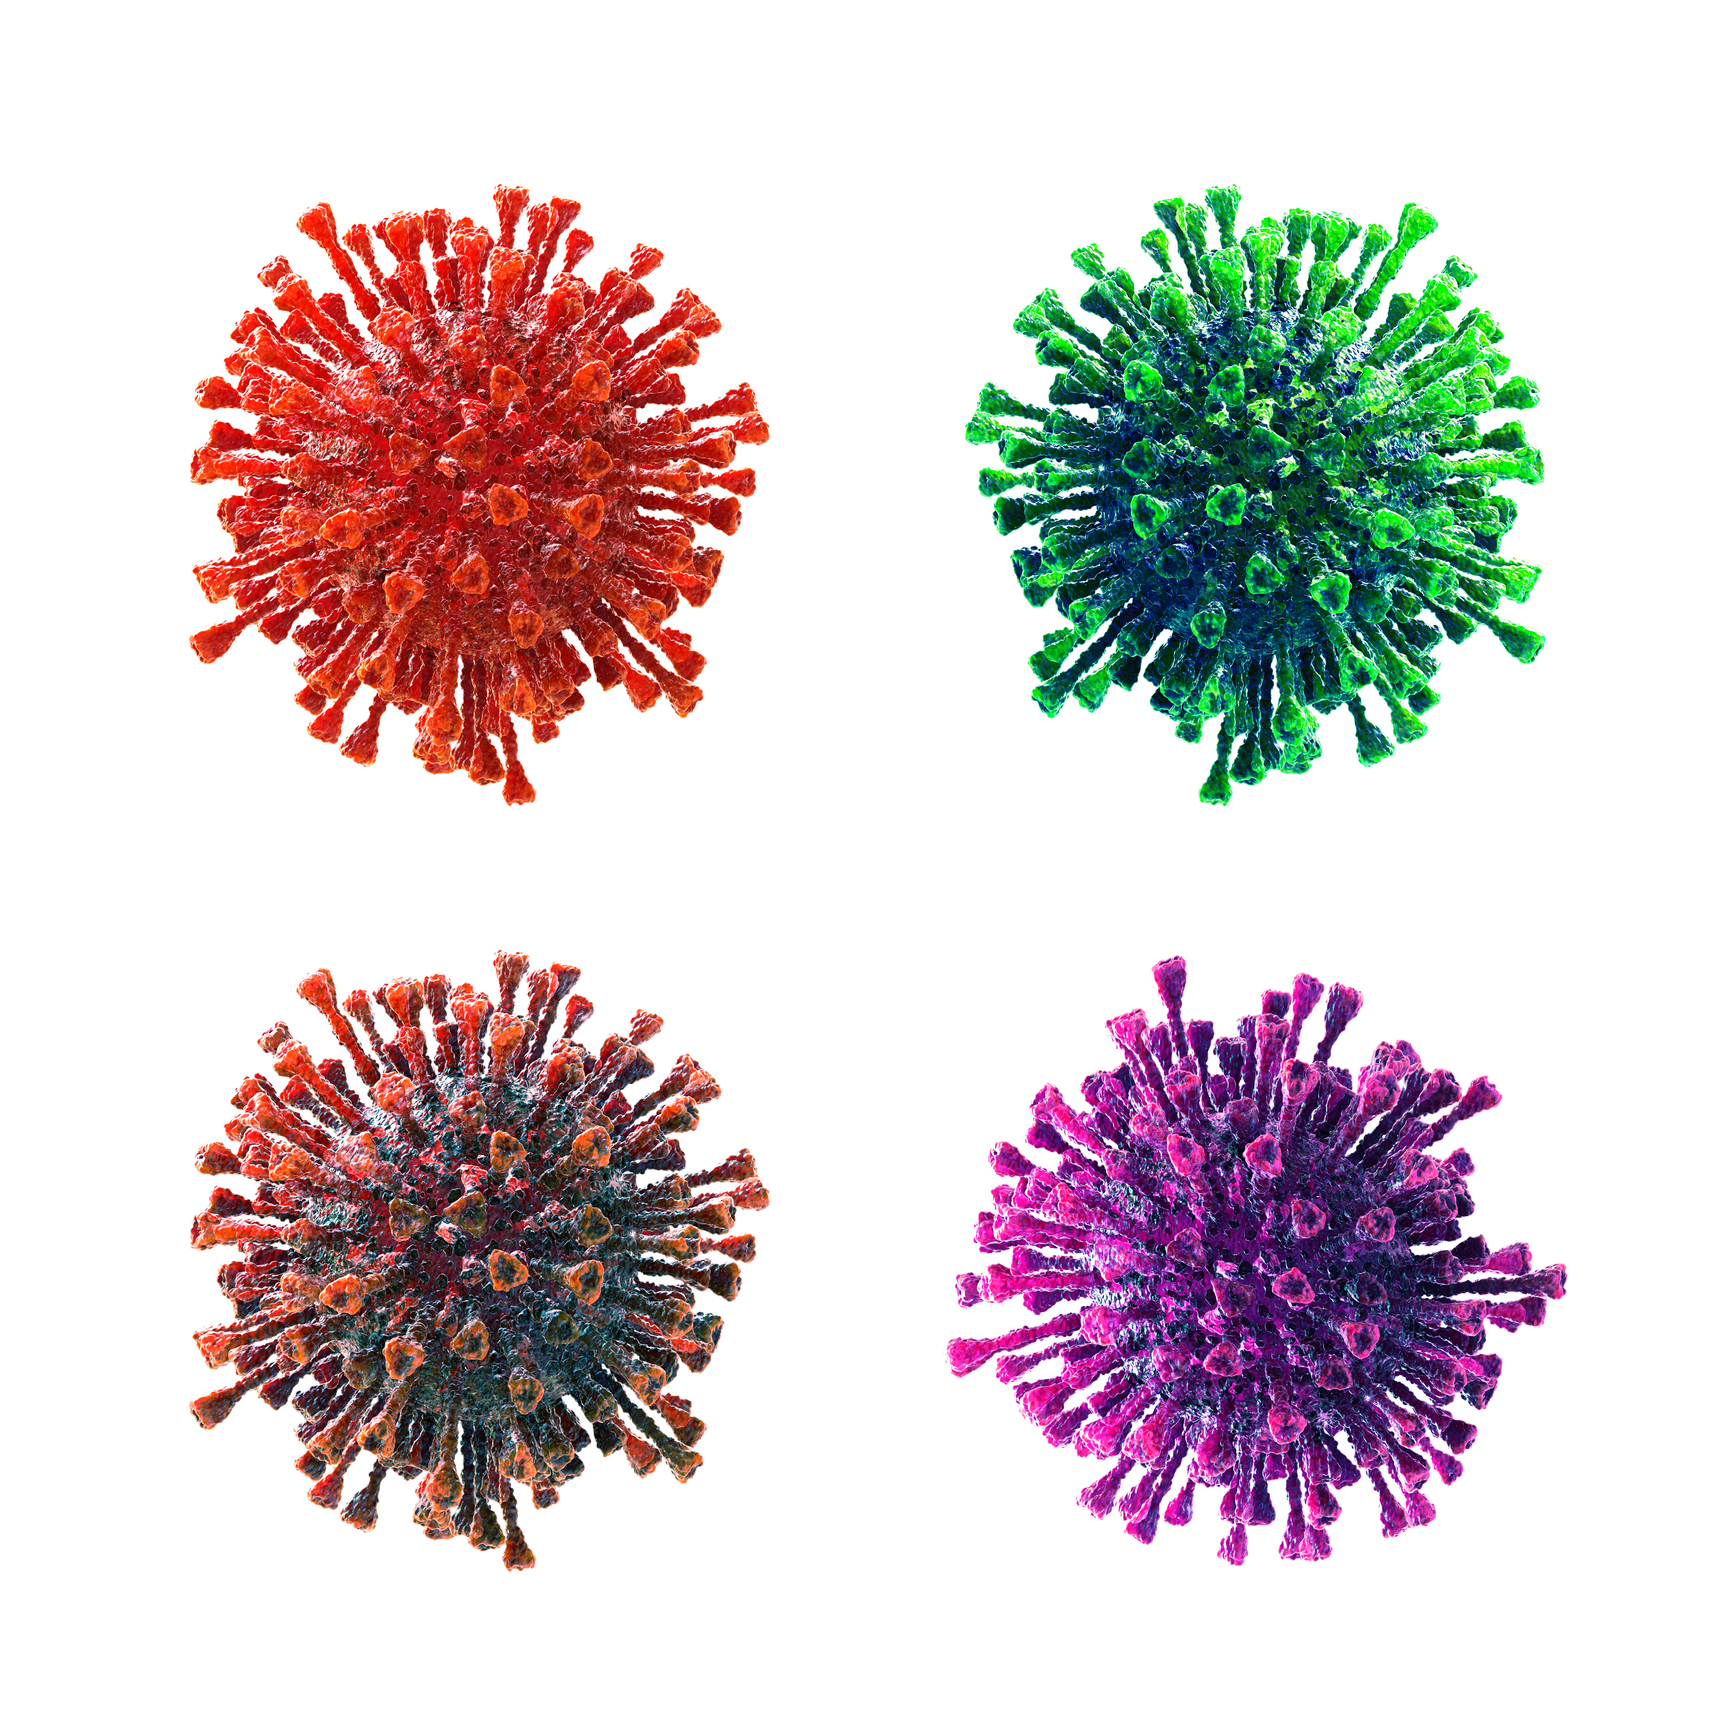 Coronavirus, virus, flu, bacteria. Abstract 3D rendered illustration isolated on white background.